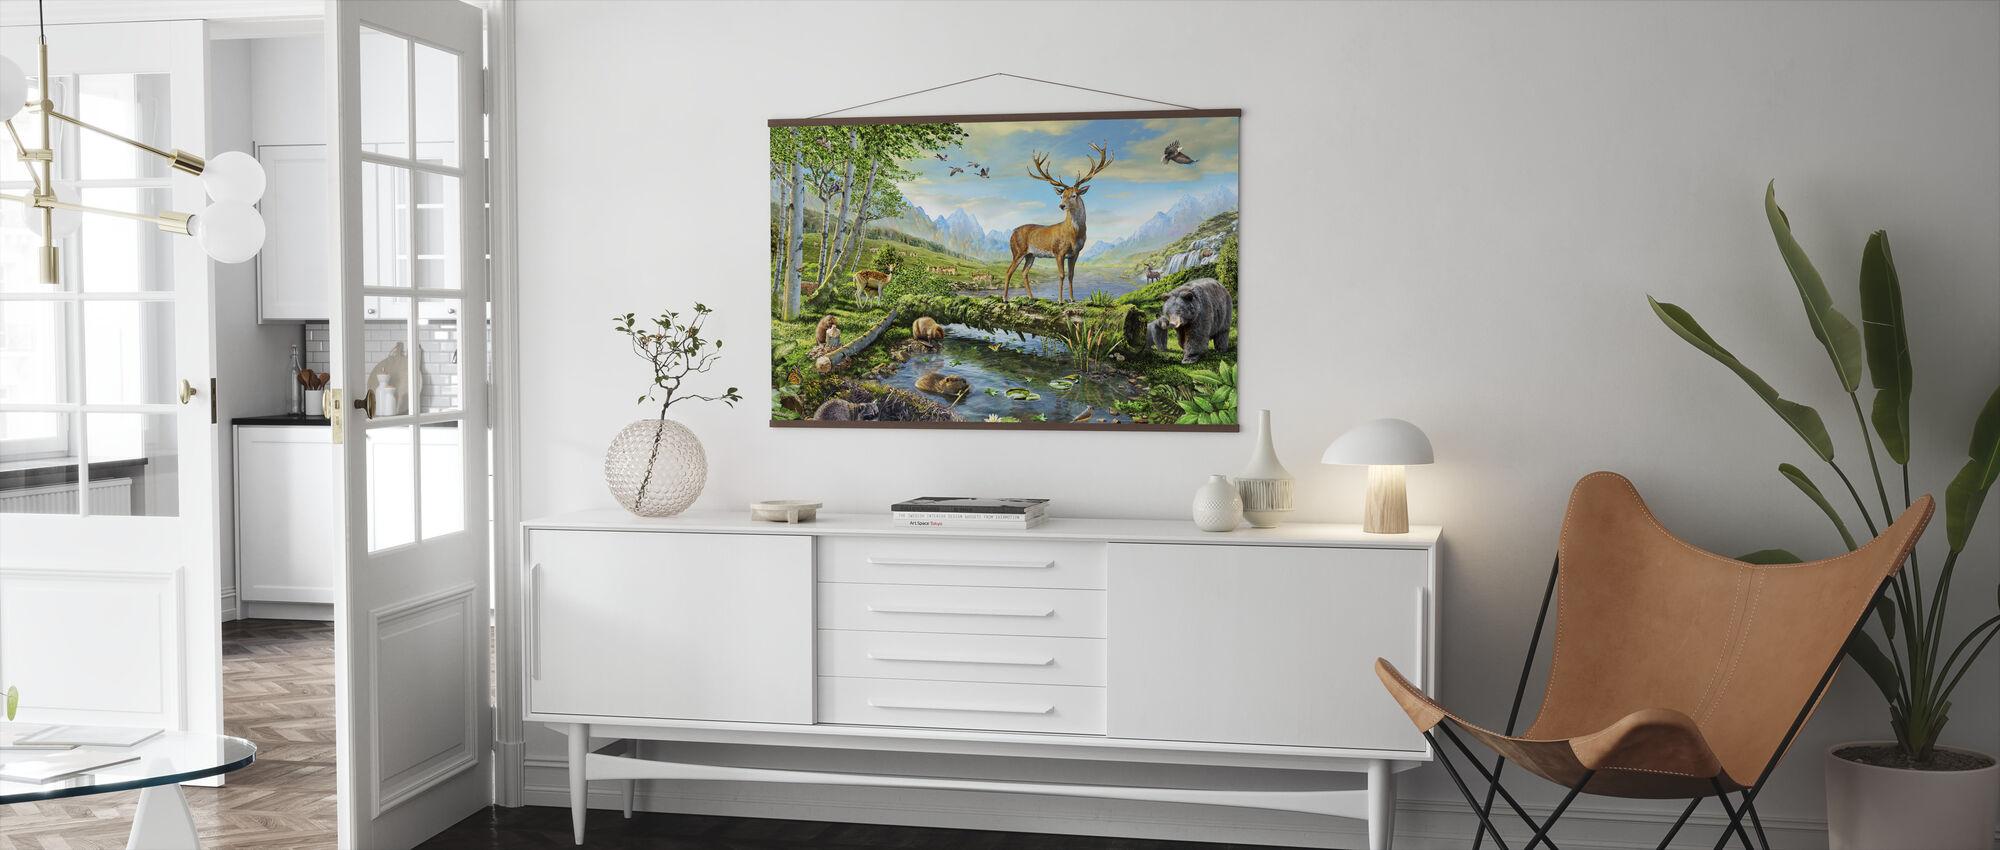 Djurliv prakt US - Poster - Vardagsrum